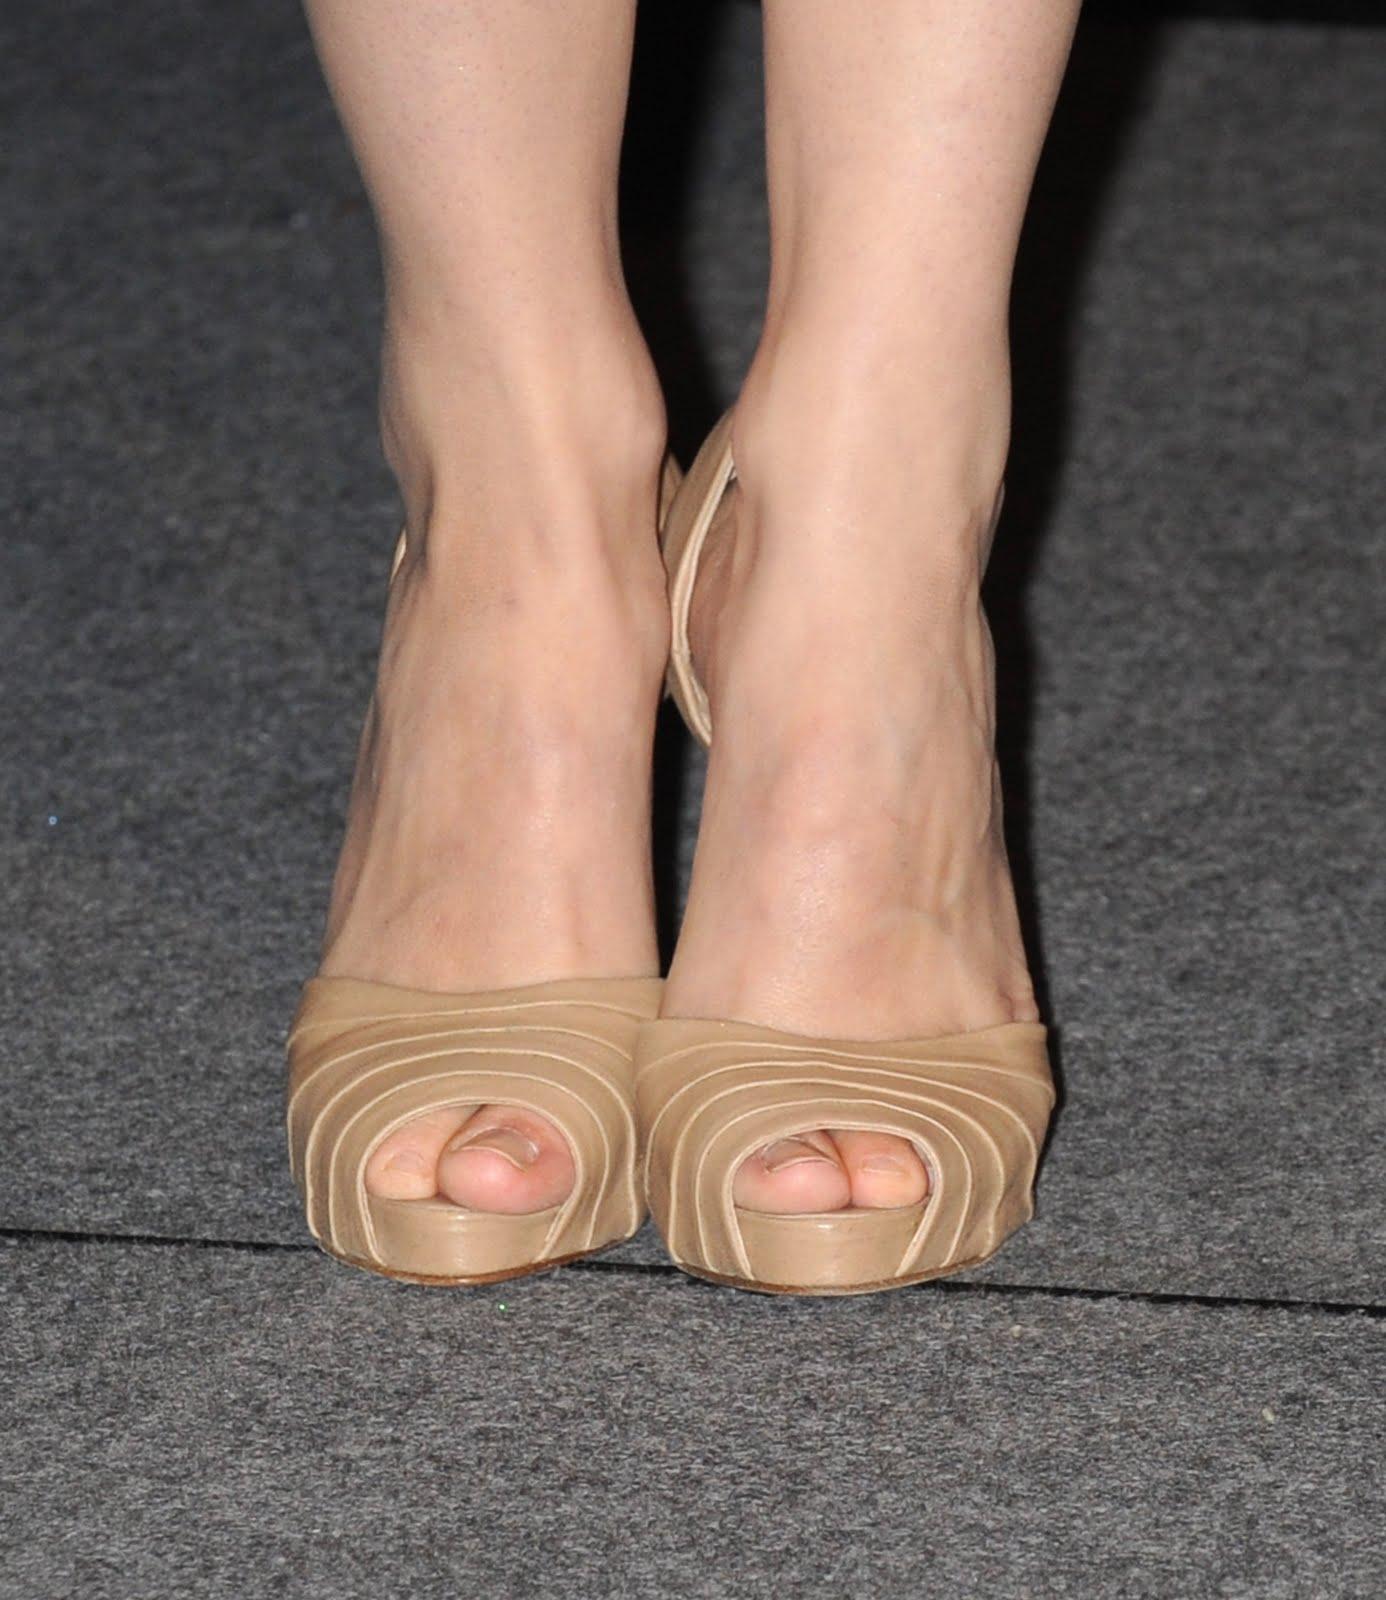 http://1.bp.blogspot.com/_bQ0SqifjNcg/S-OODJwvJuI/AAAAAAAAUF0/8VOtuELvZ_I/s1600/rachel-mcadams-feet.jpg